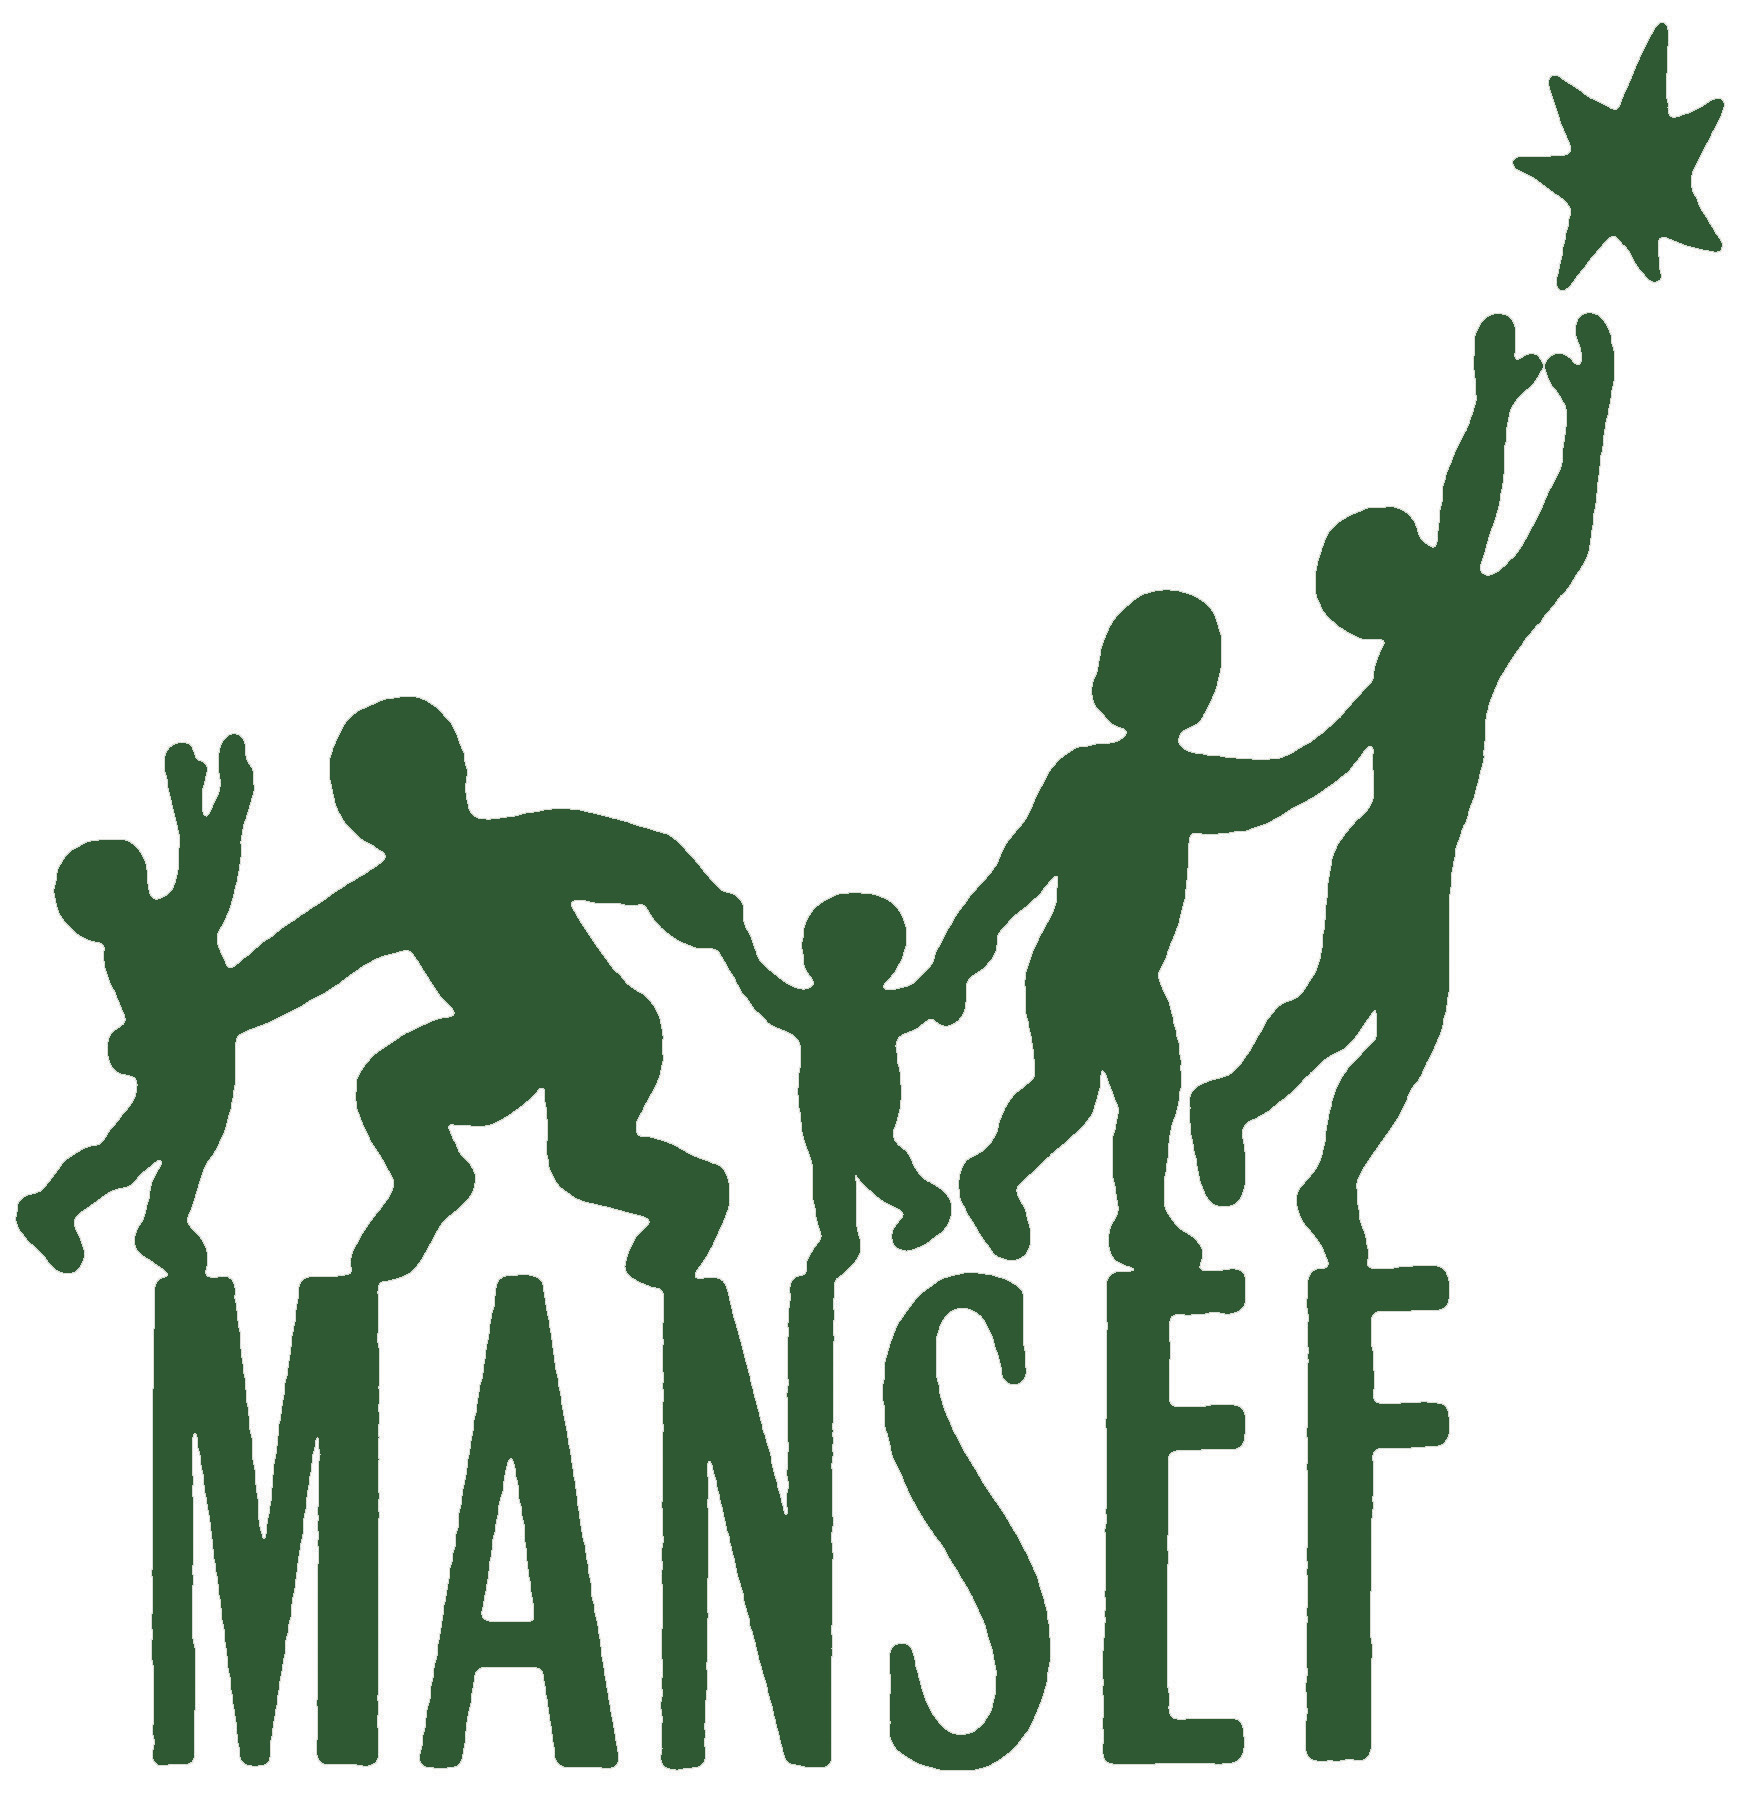 manlogo-green - Copy